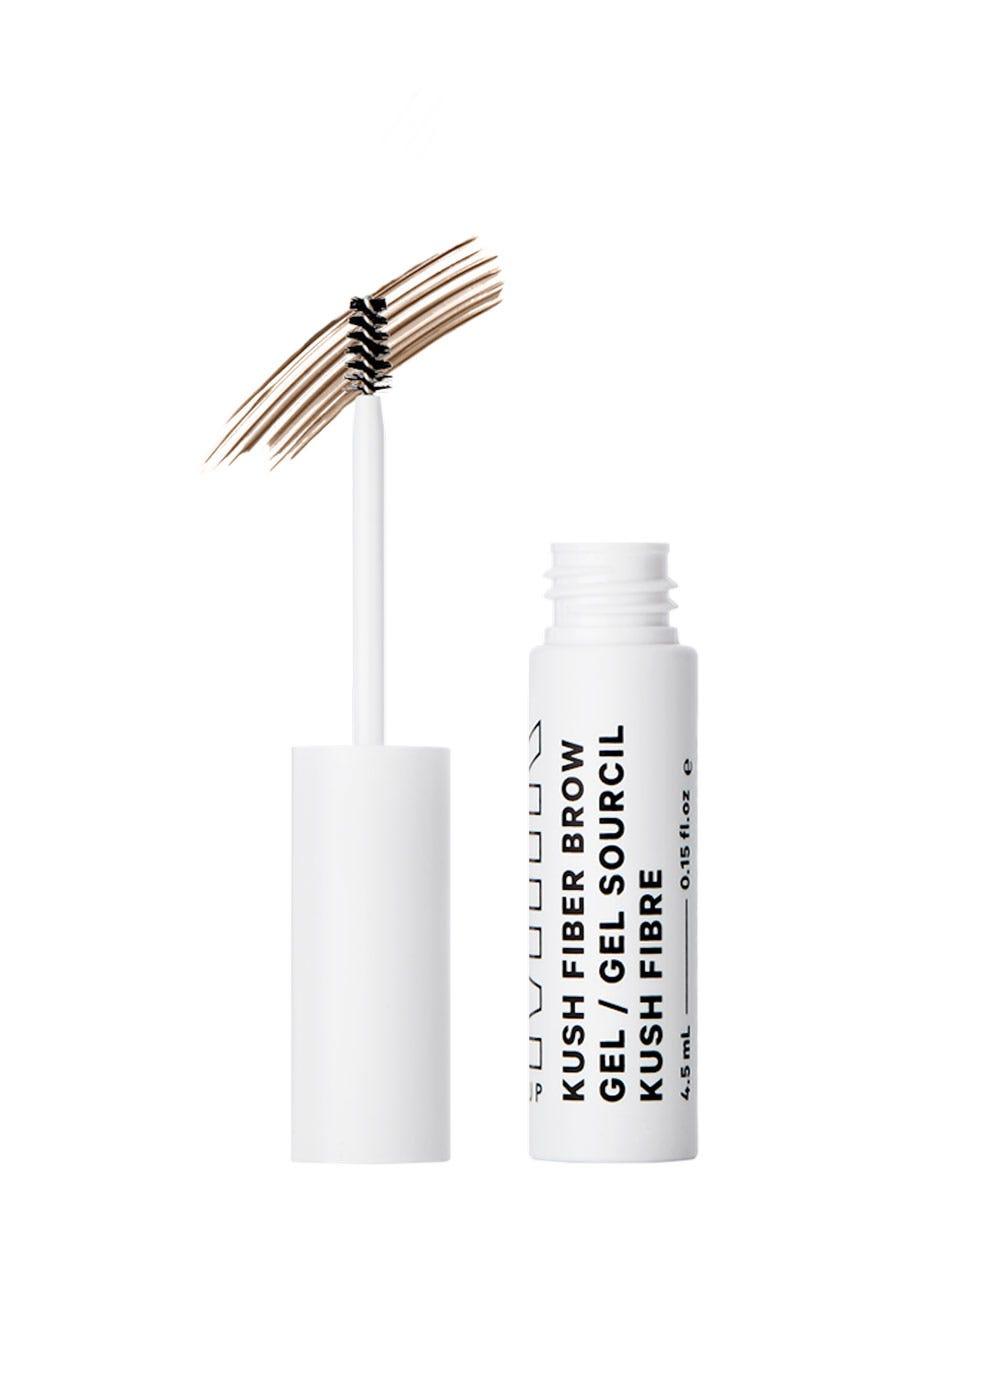 fab8800e37441 Milk Makeup Products UK - Skincare